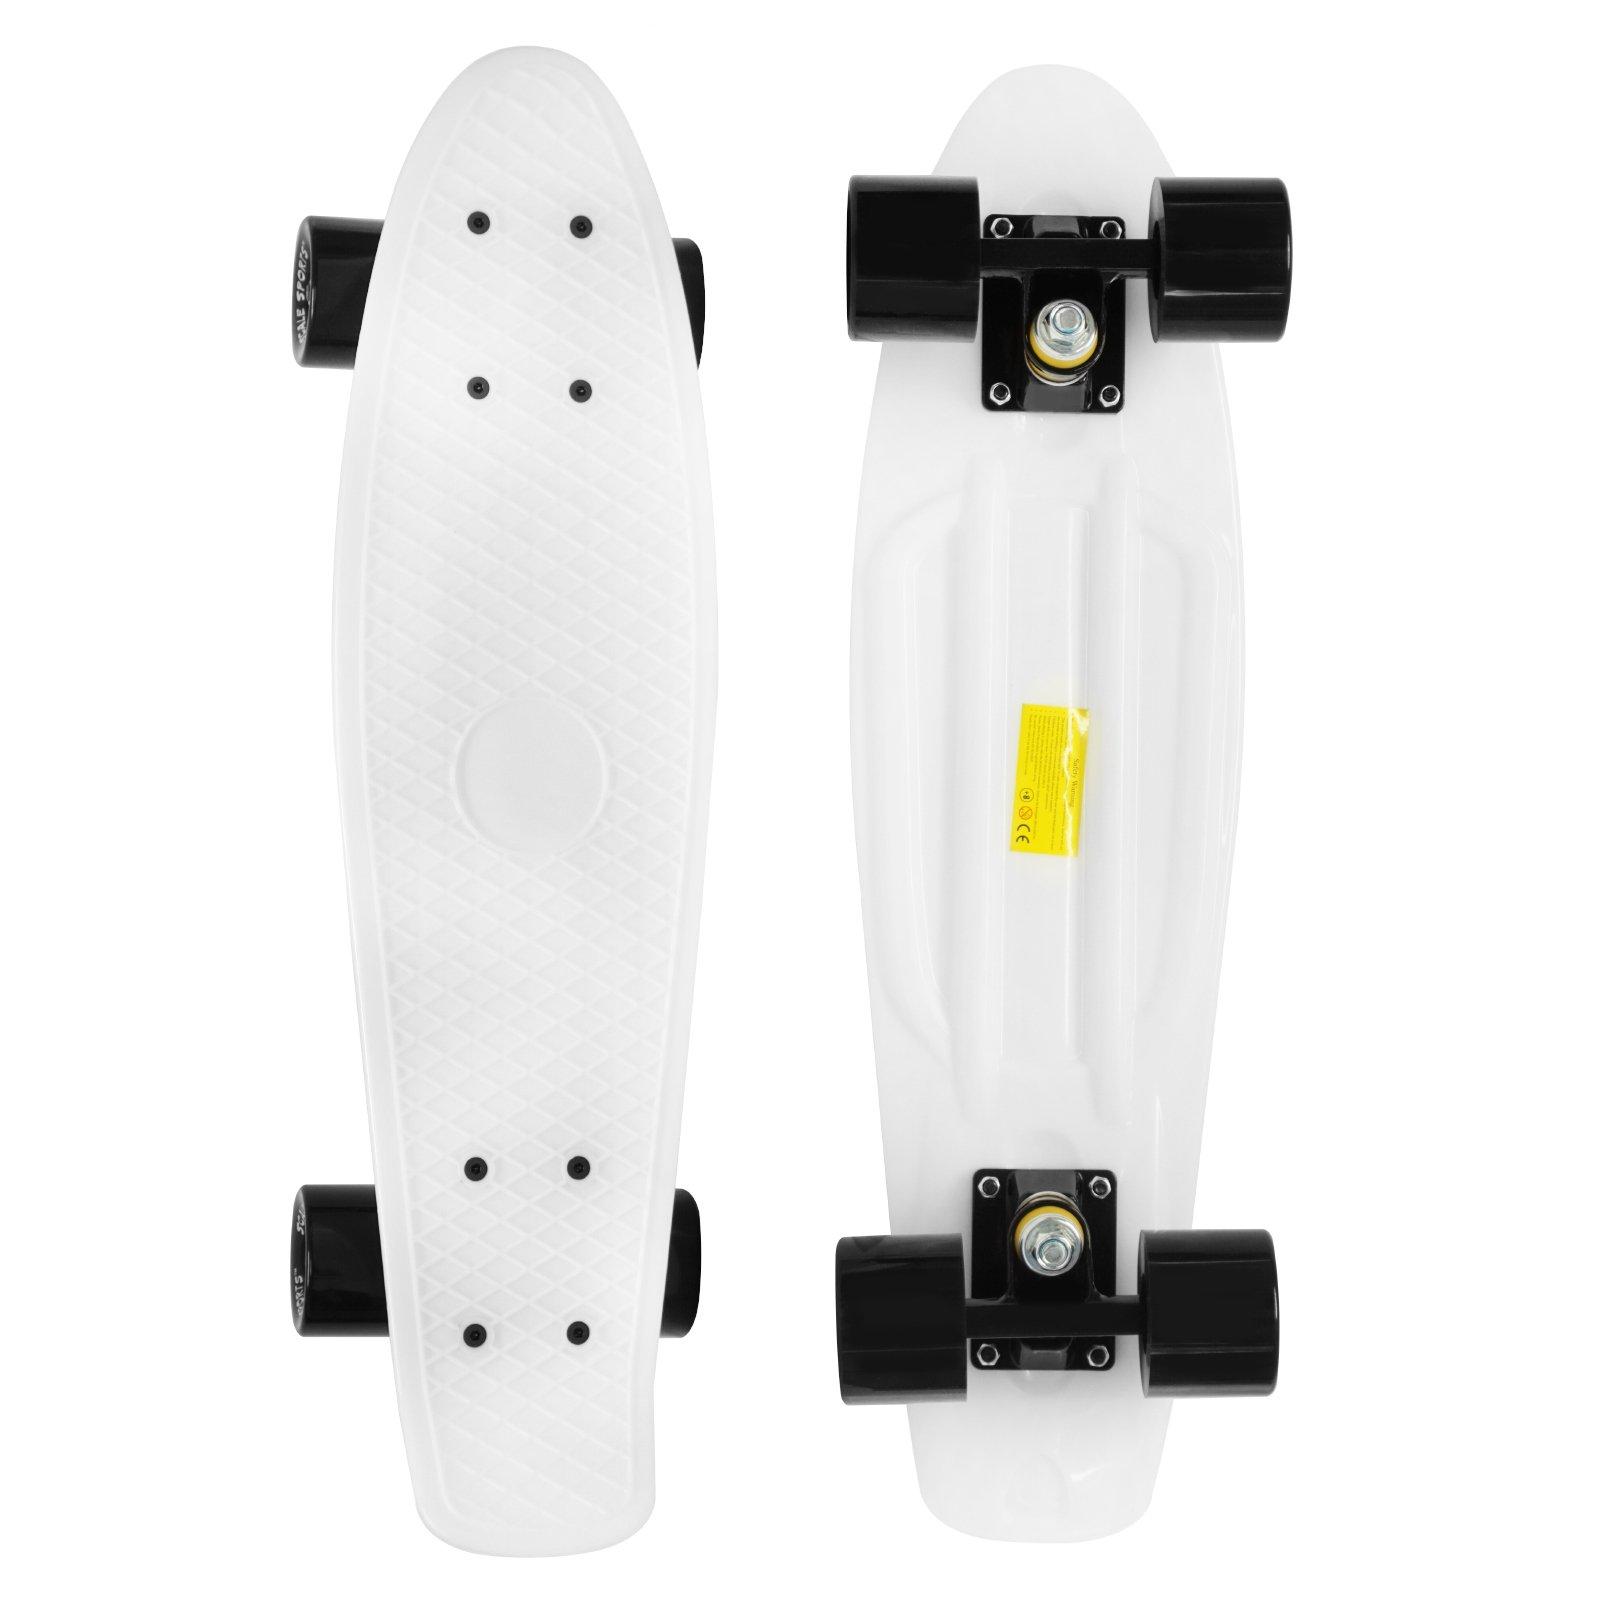 Scale Sports 22'' Skateboard Complete Pastel Street Retro Cruiser Classic Plastic Deck White